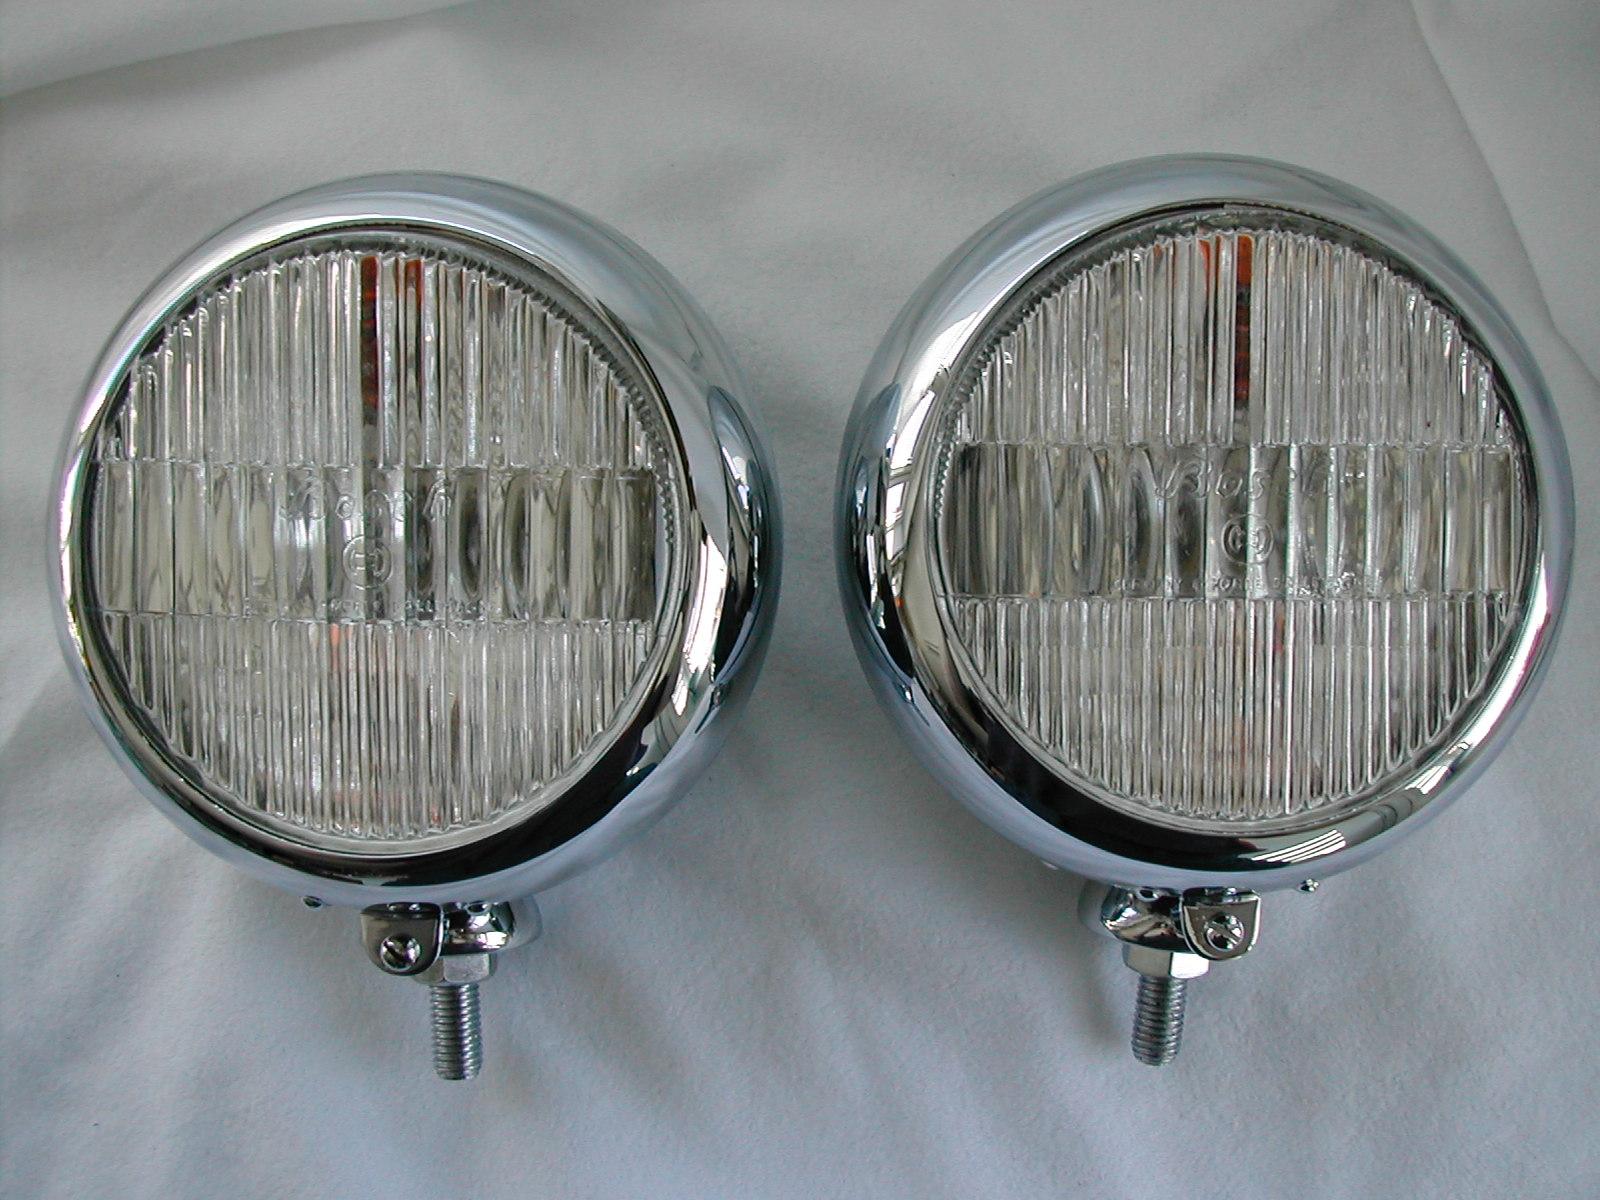 Bosch Spot Lamps Vintage Headlamp Restoration International